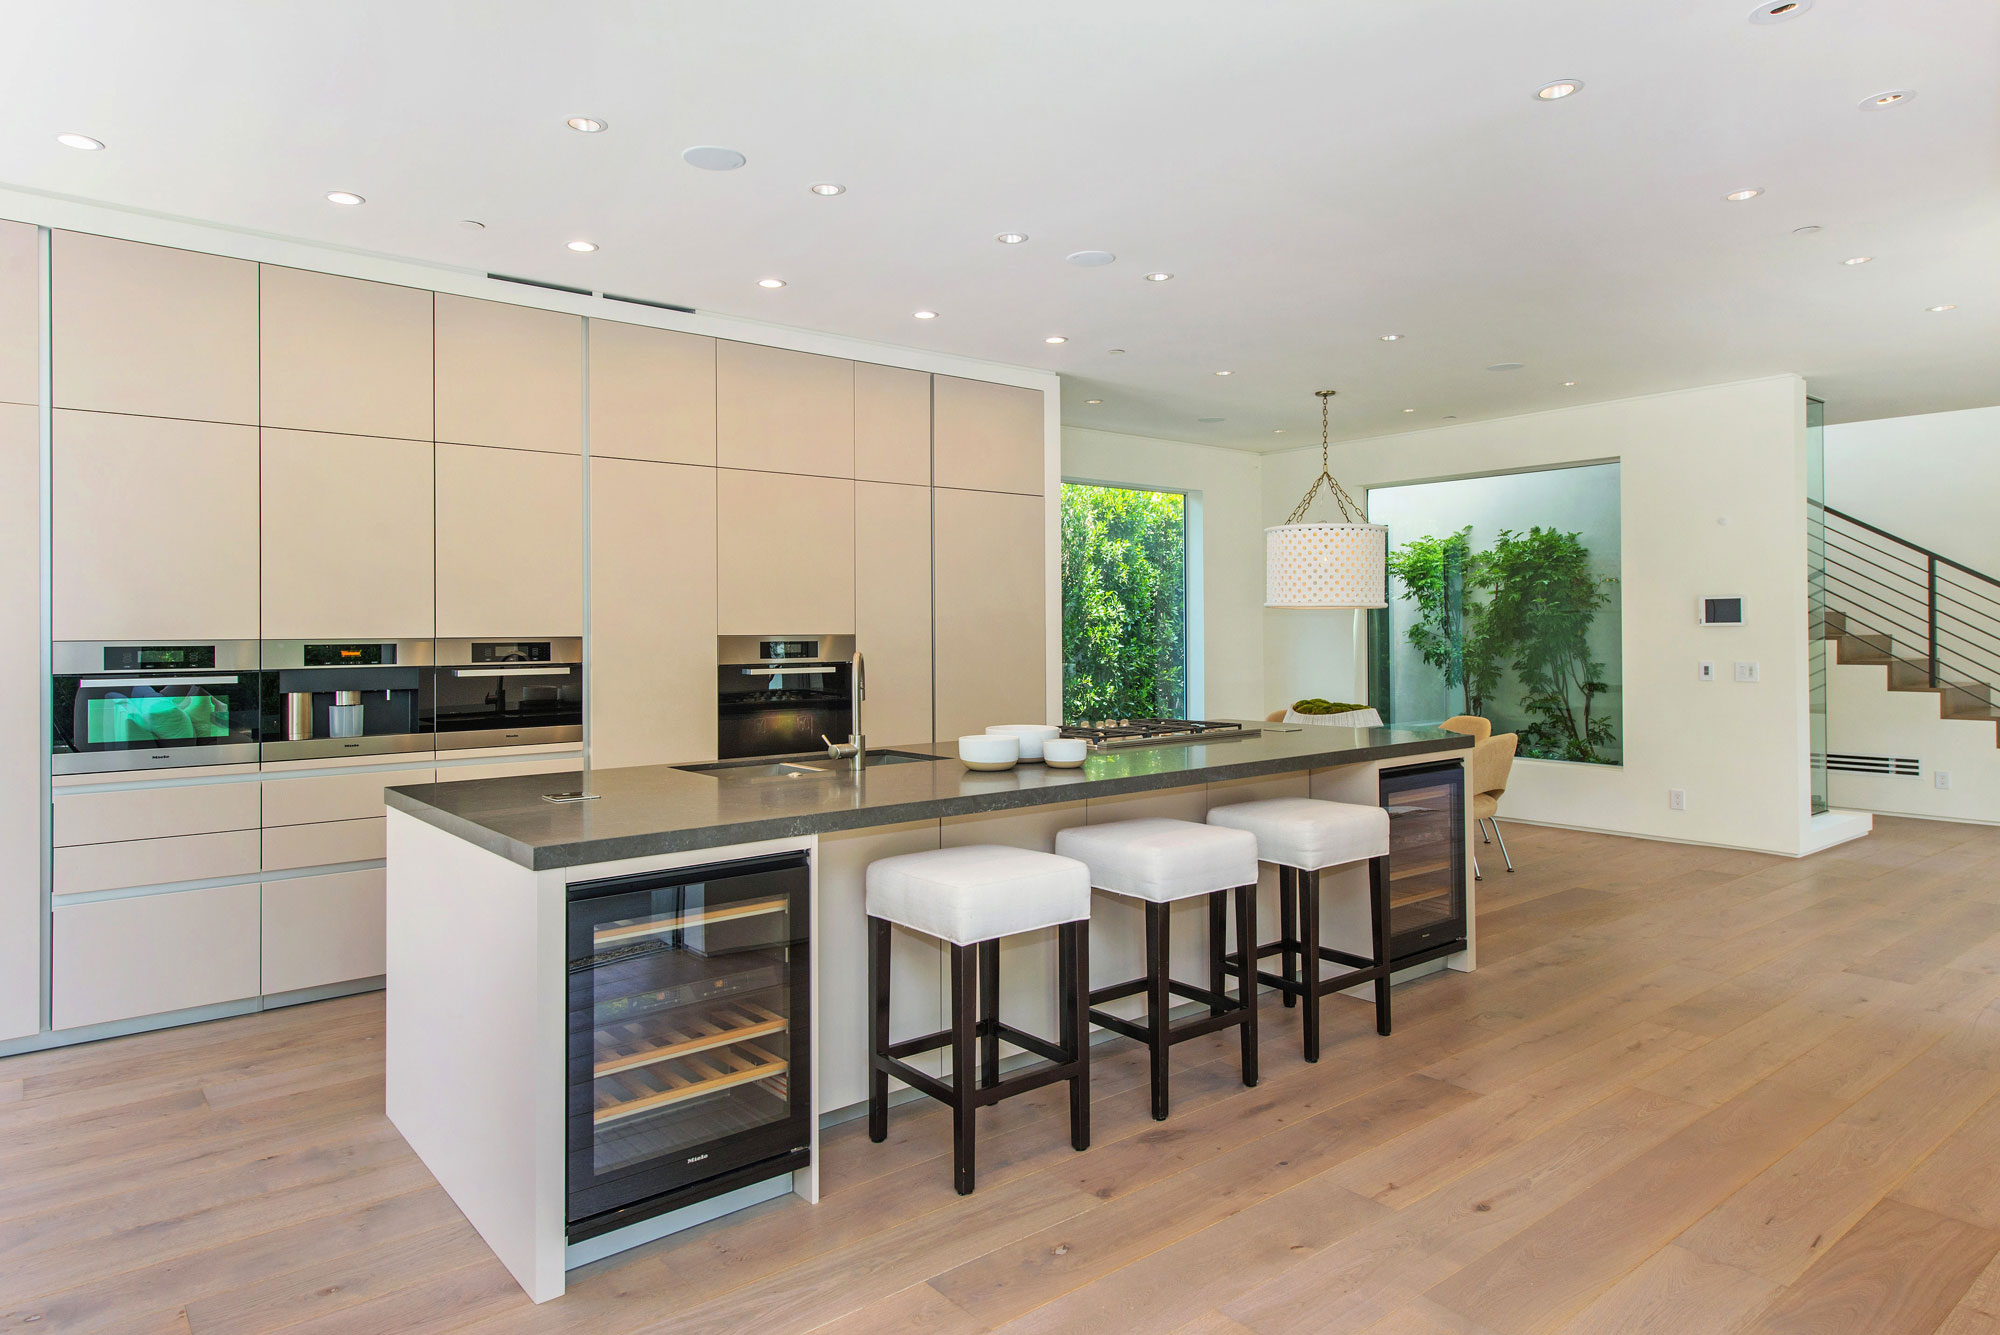 Бежевый пол и фасад гарнитура на кухне